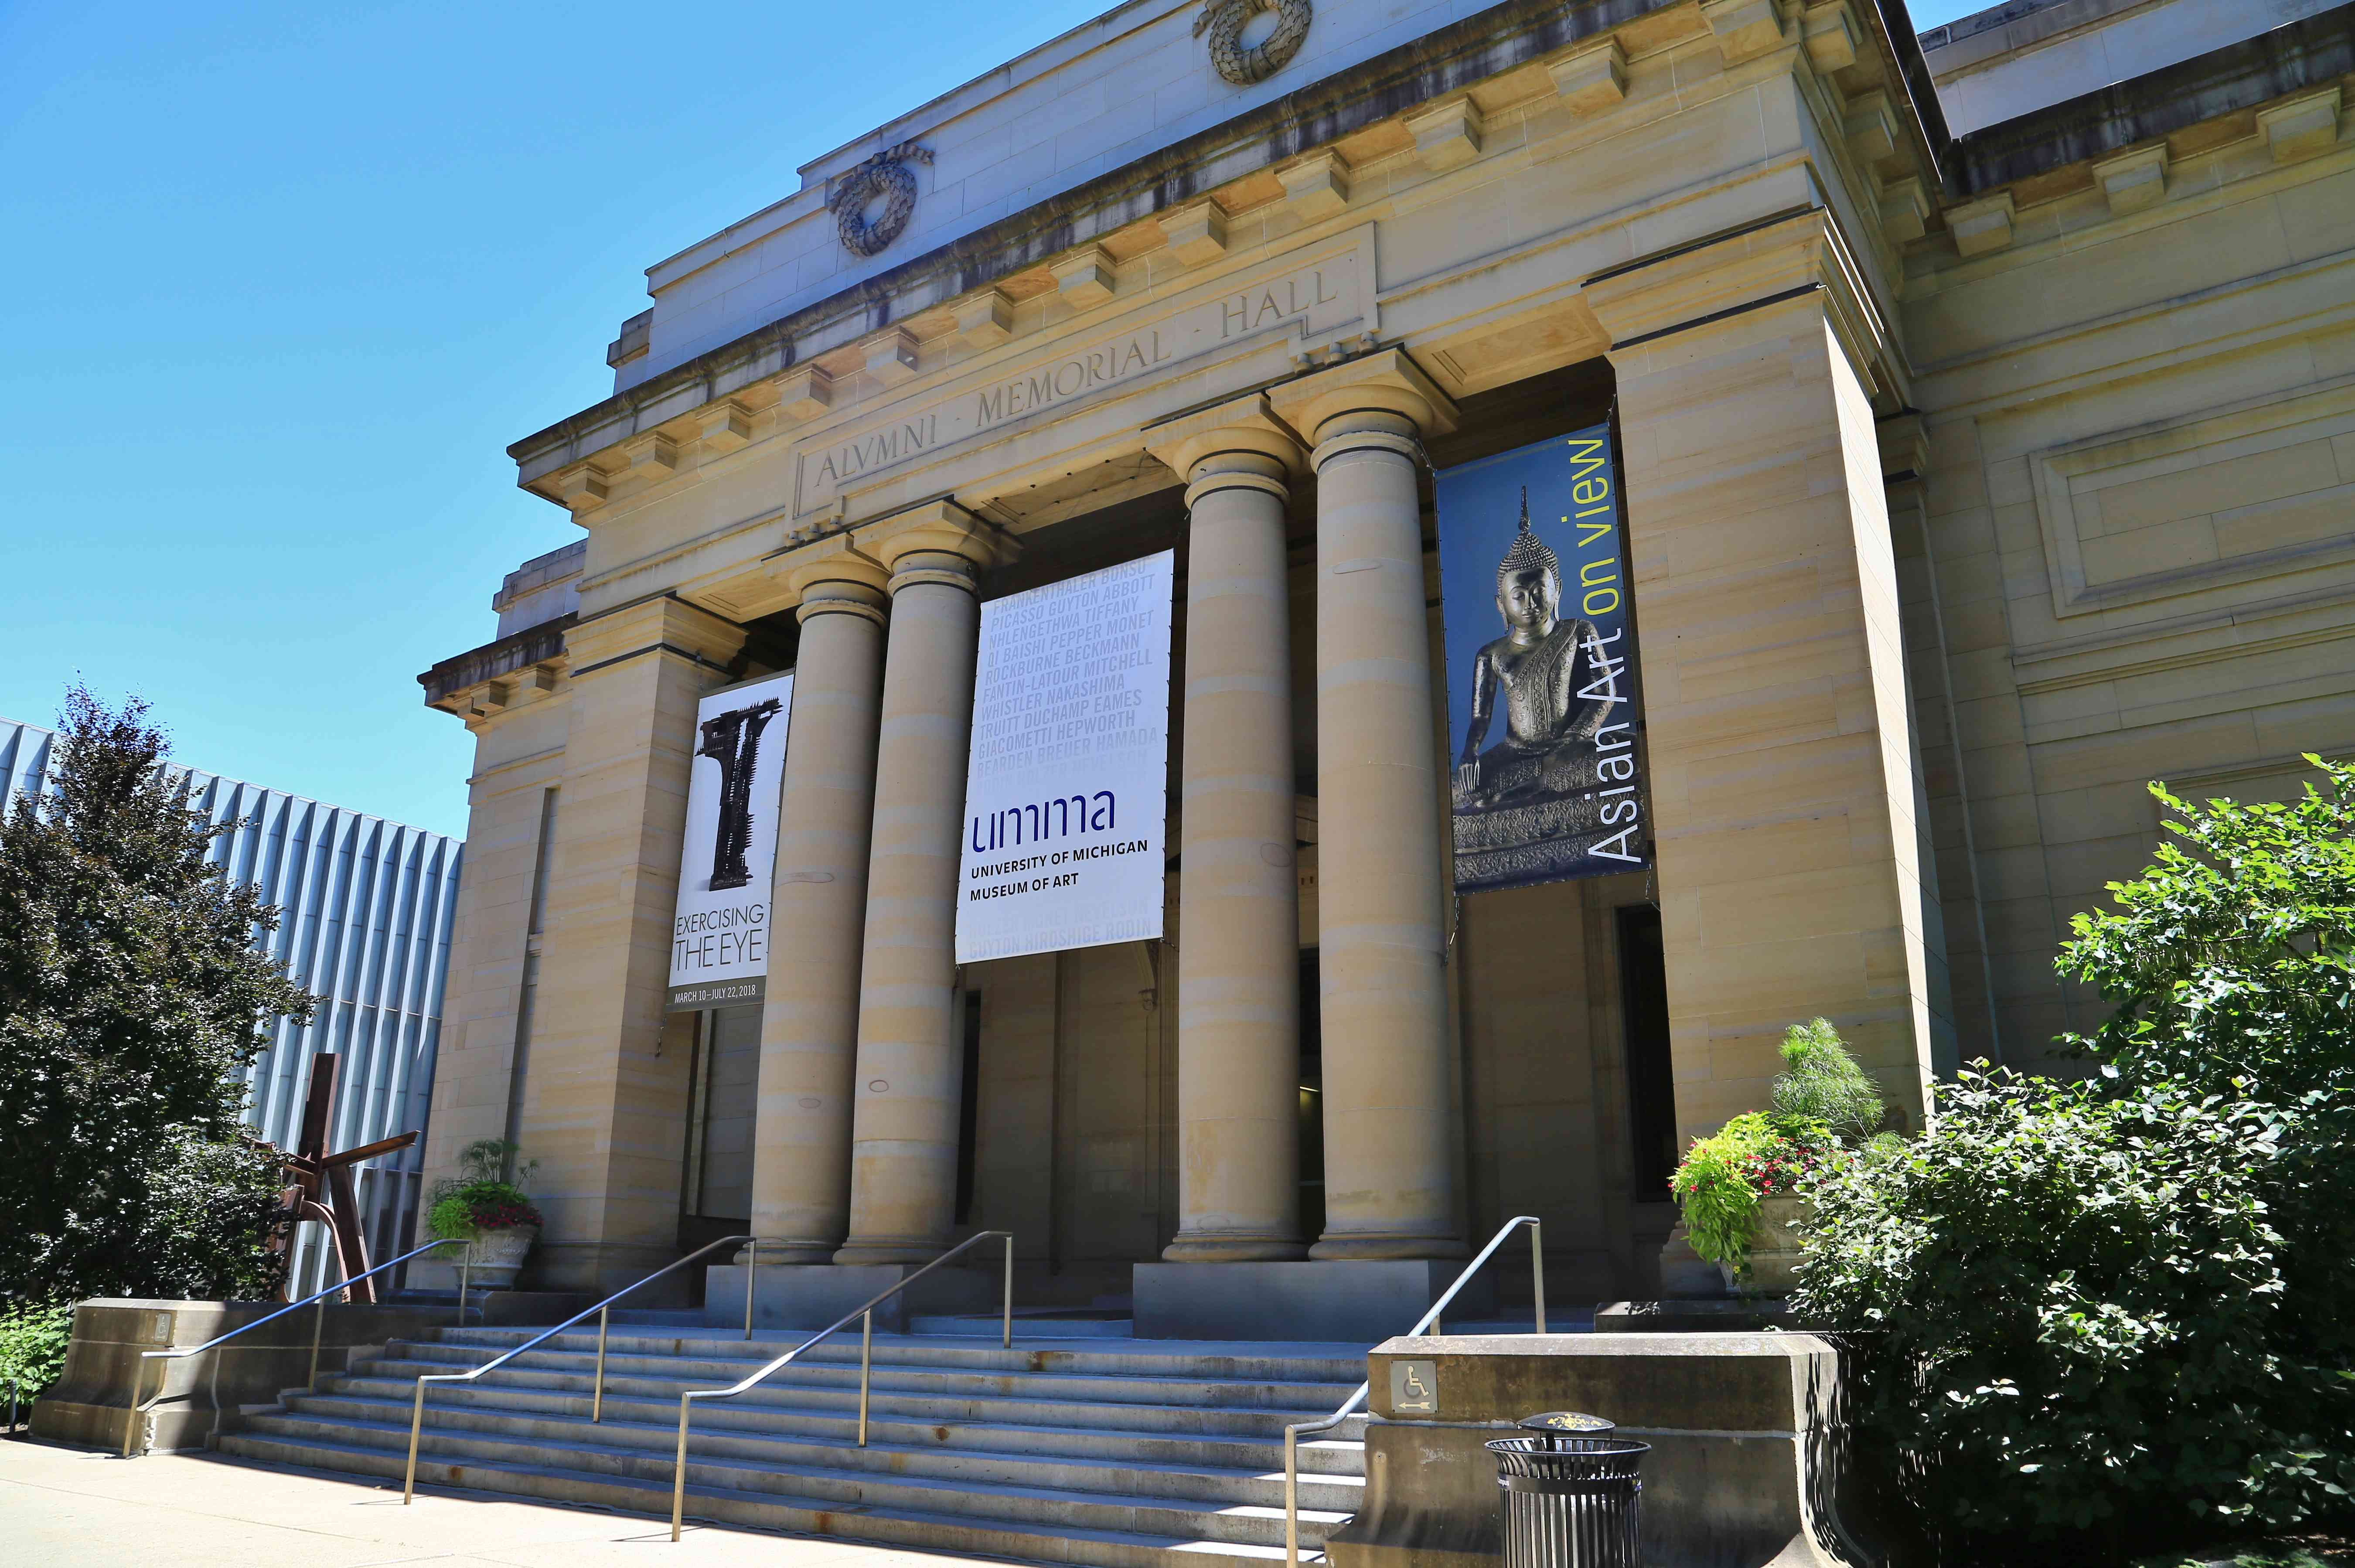 Museo de Arte de la Universidad de Michigan, Ann Arbor, Michigan, EE. UU. , Matthaei Botanical Gardens and Nichol Arboretum